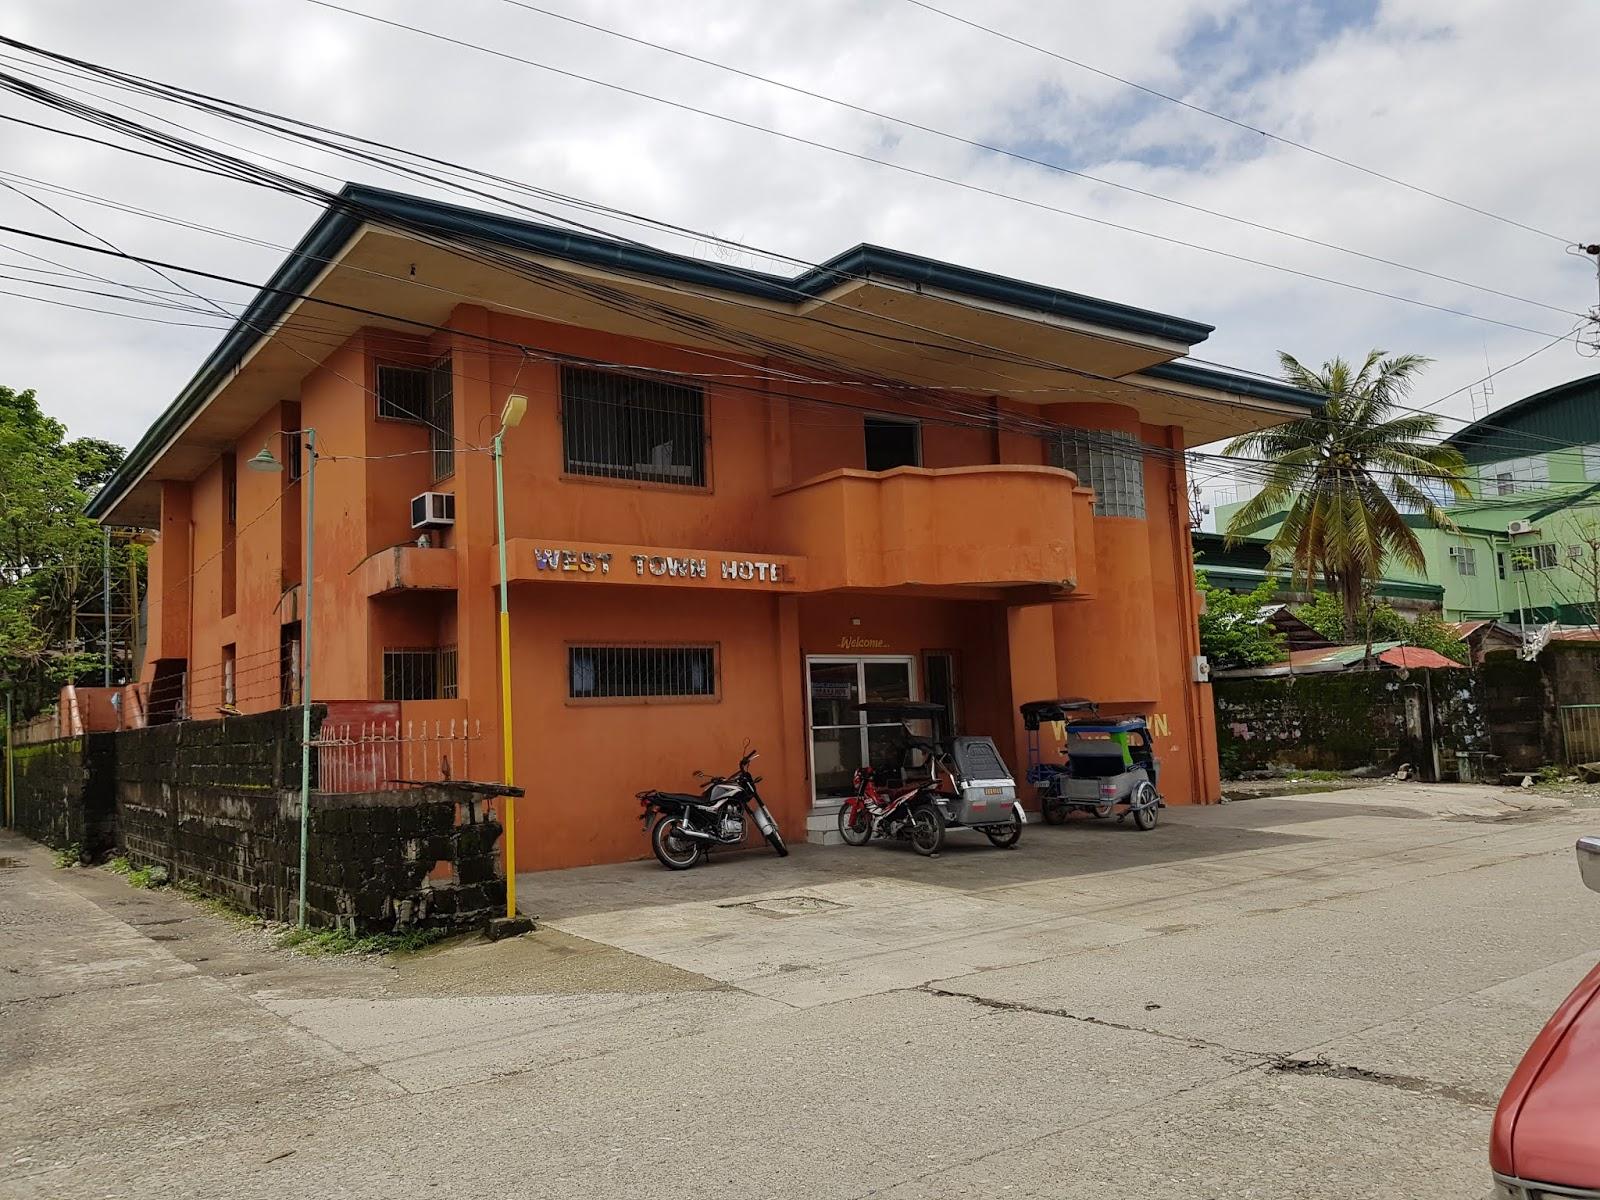 JDS Hotel & Restaurant Map - San Jose, Philippines - Mapcarta